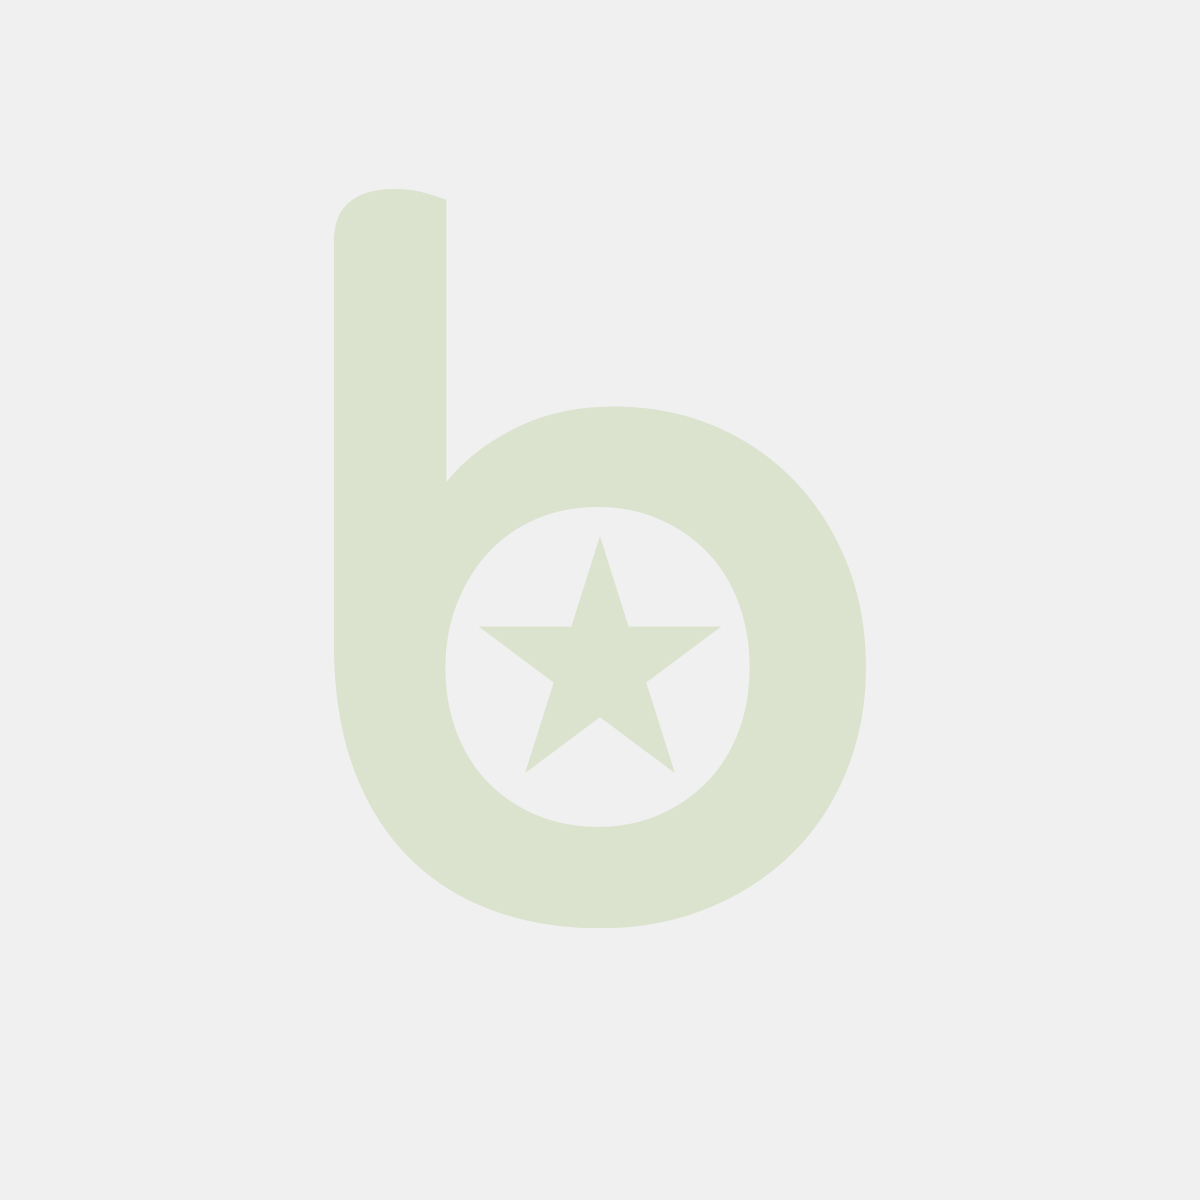 Blender Barmański Tango Hamilton Beach Dzbanek Z Poliwęglanu Do Hbh450-Ce